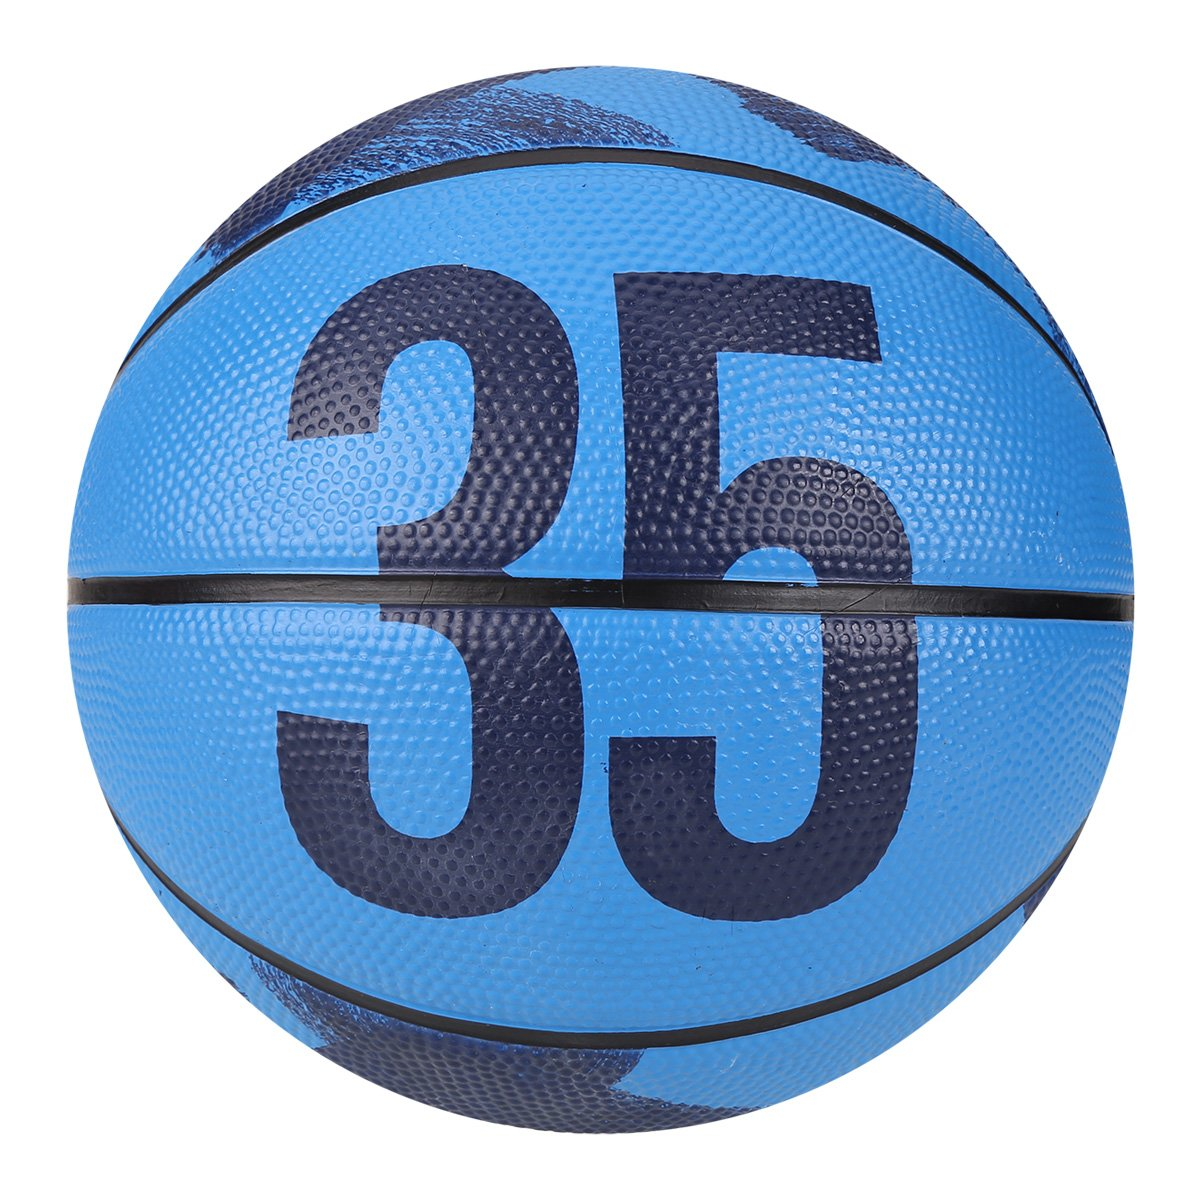 Mini Bola Basquete Nike KD Tam 3 - Compre Agora  b7a206fa04200